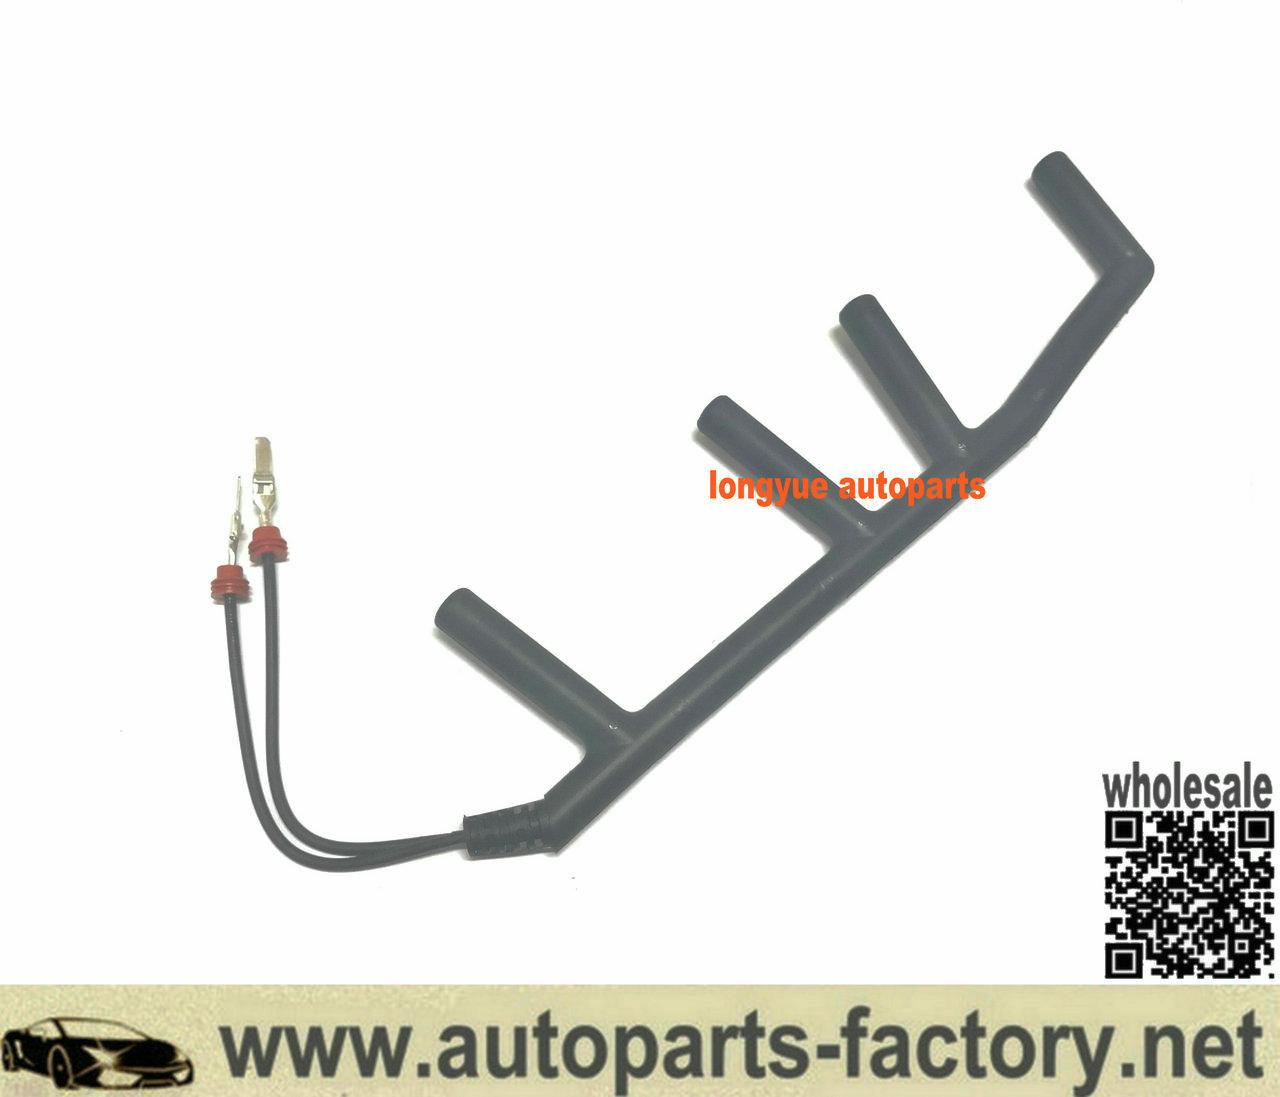 Vw Jetta Alternator Wiring Harness On Volkswagen Beetle Alternator